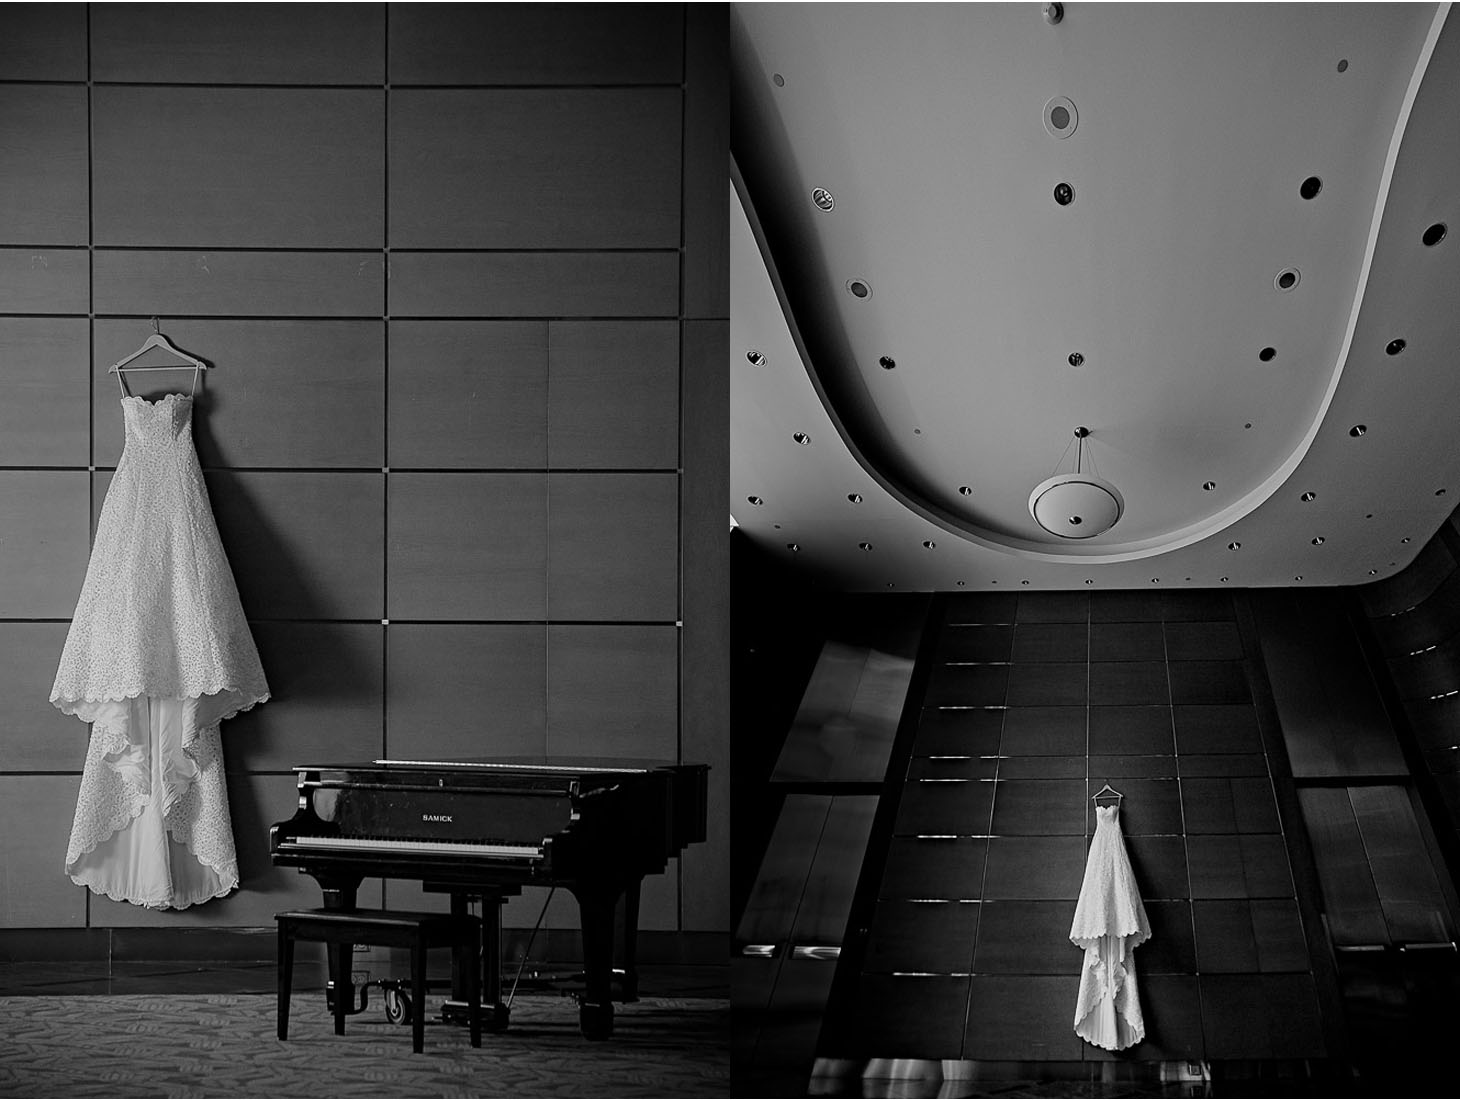 2015_07_12-Cloris-Chao-1273.jpg